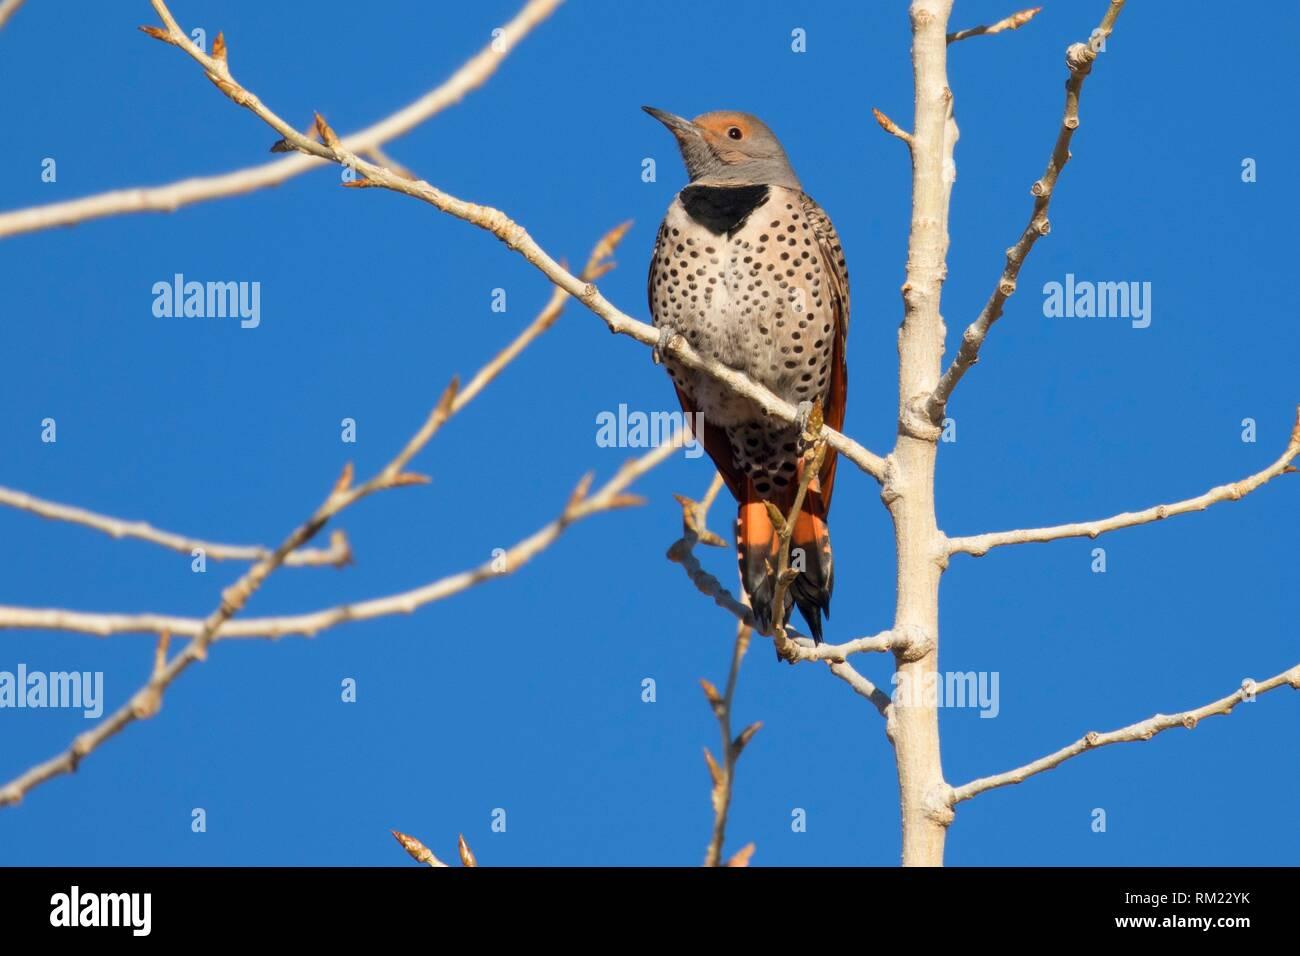 Northern flicker, Bernardo Wildlife Management Area, New Mexico. - Stock Image